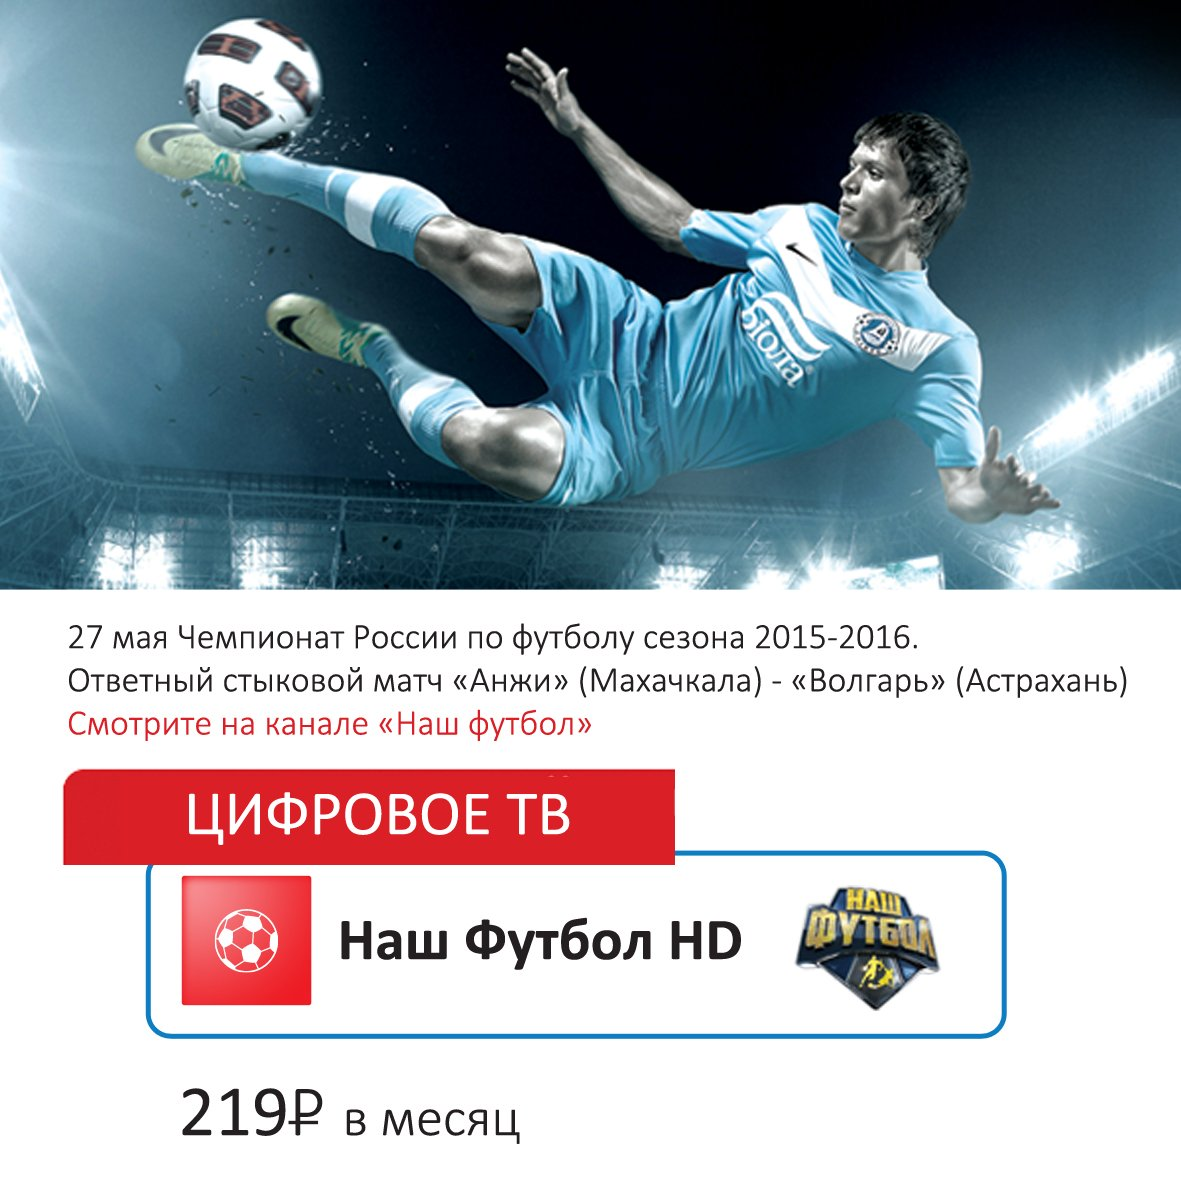 чемпионат фнл 2014-2015 таблица